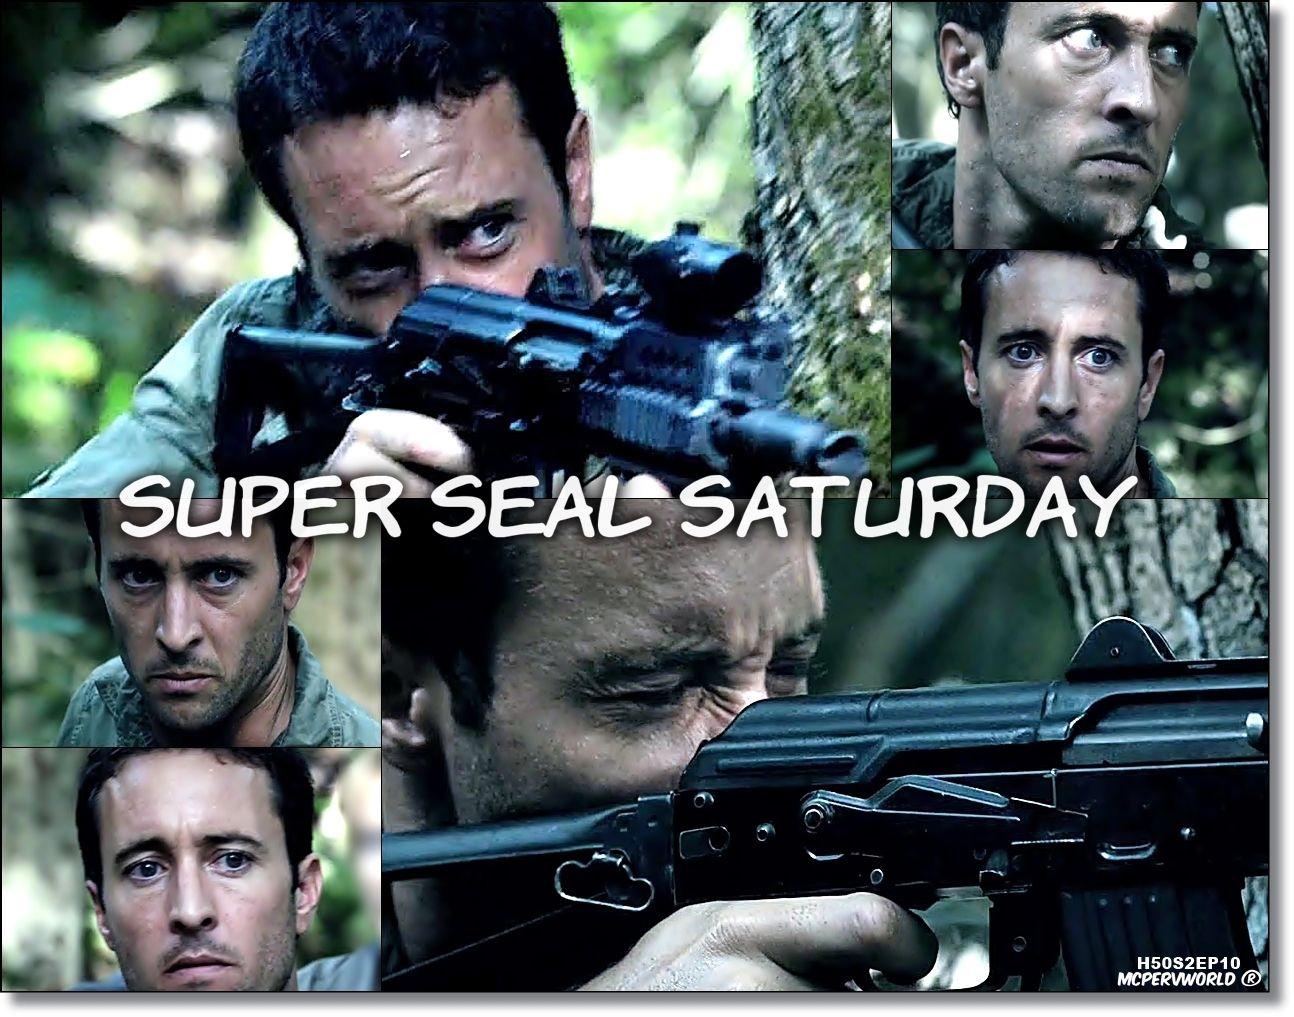 Super SEAL Saturday